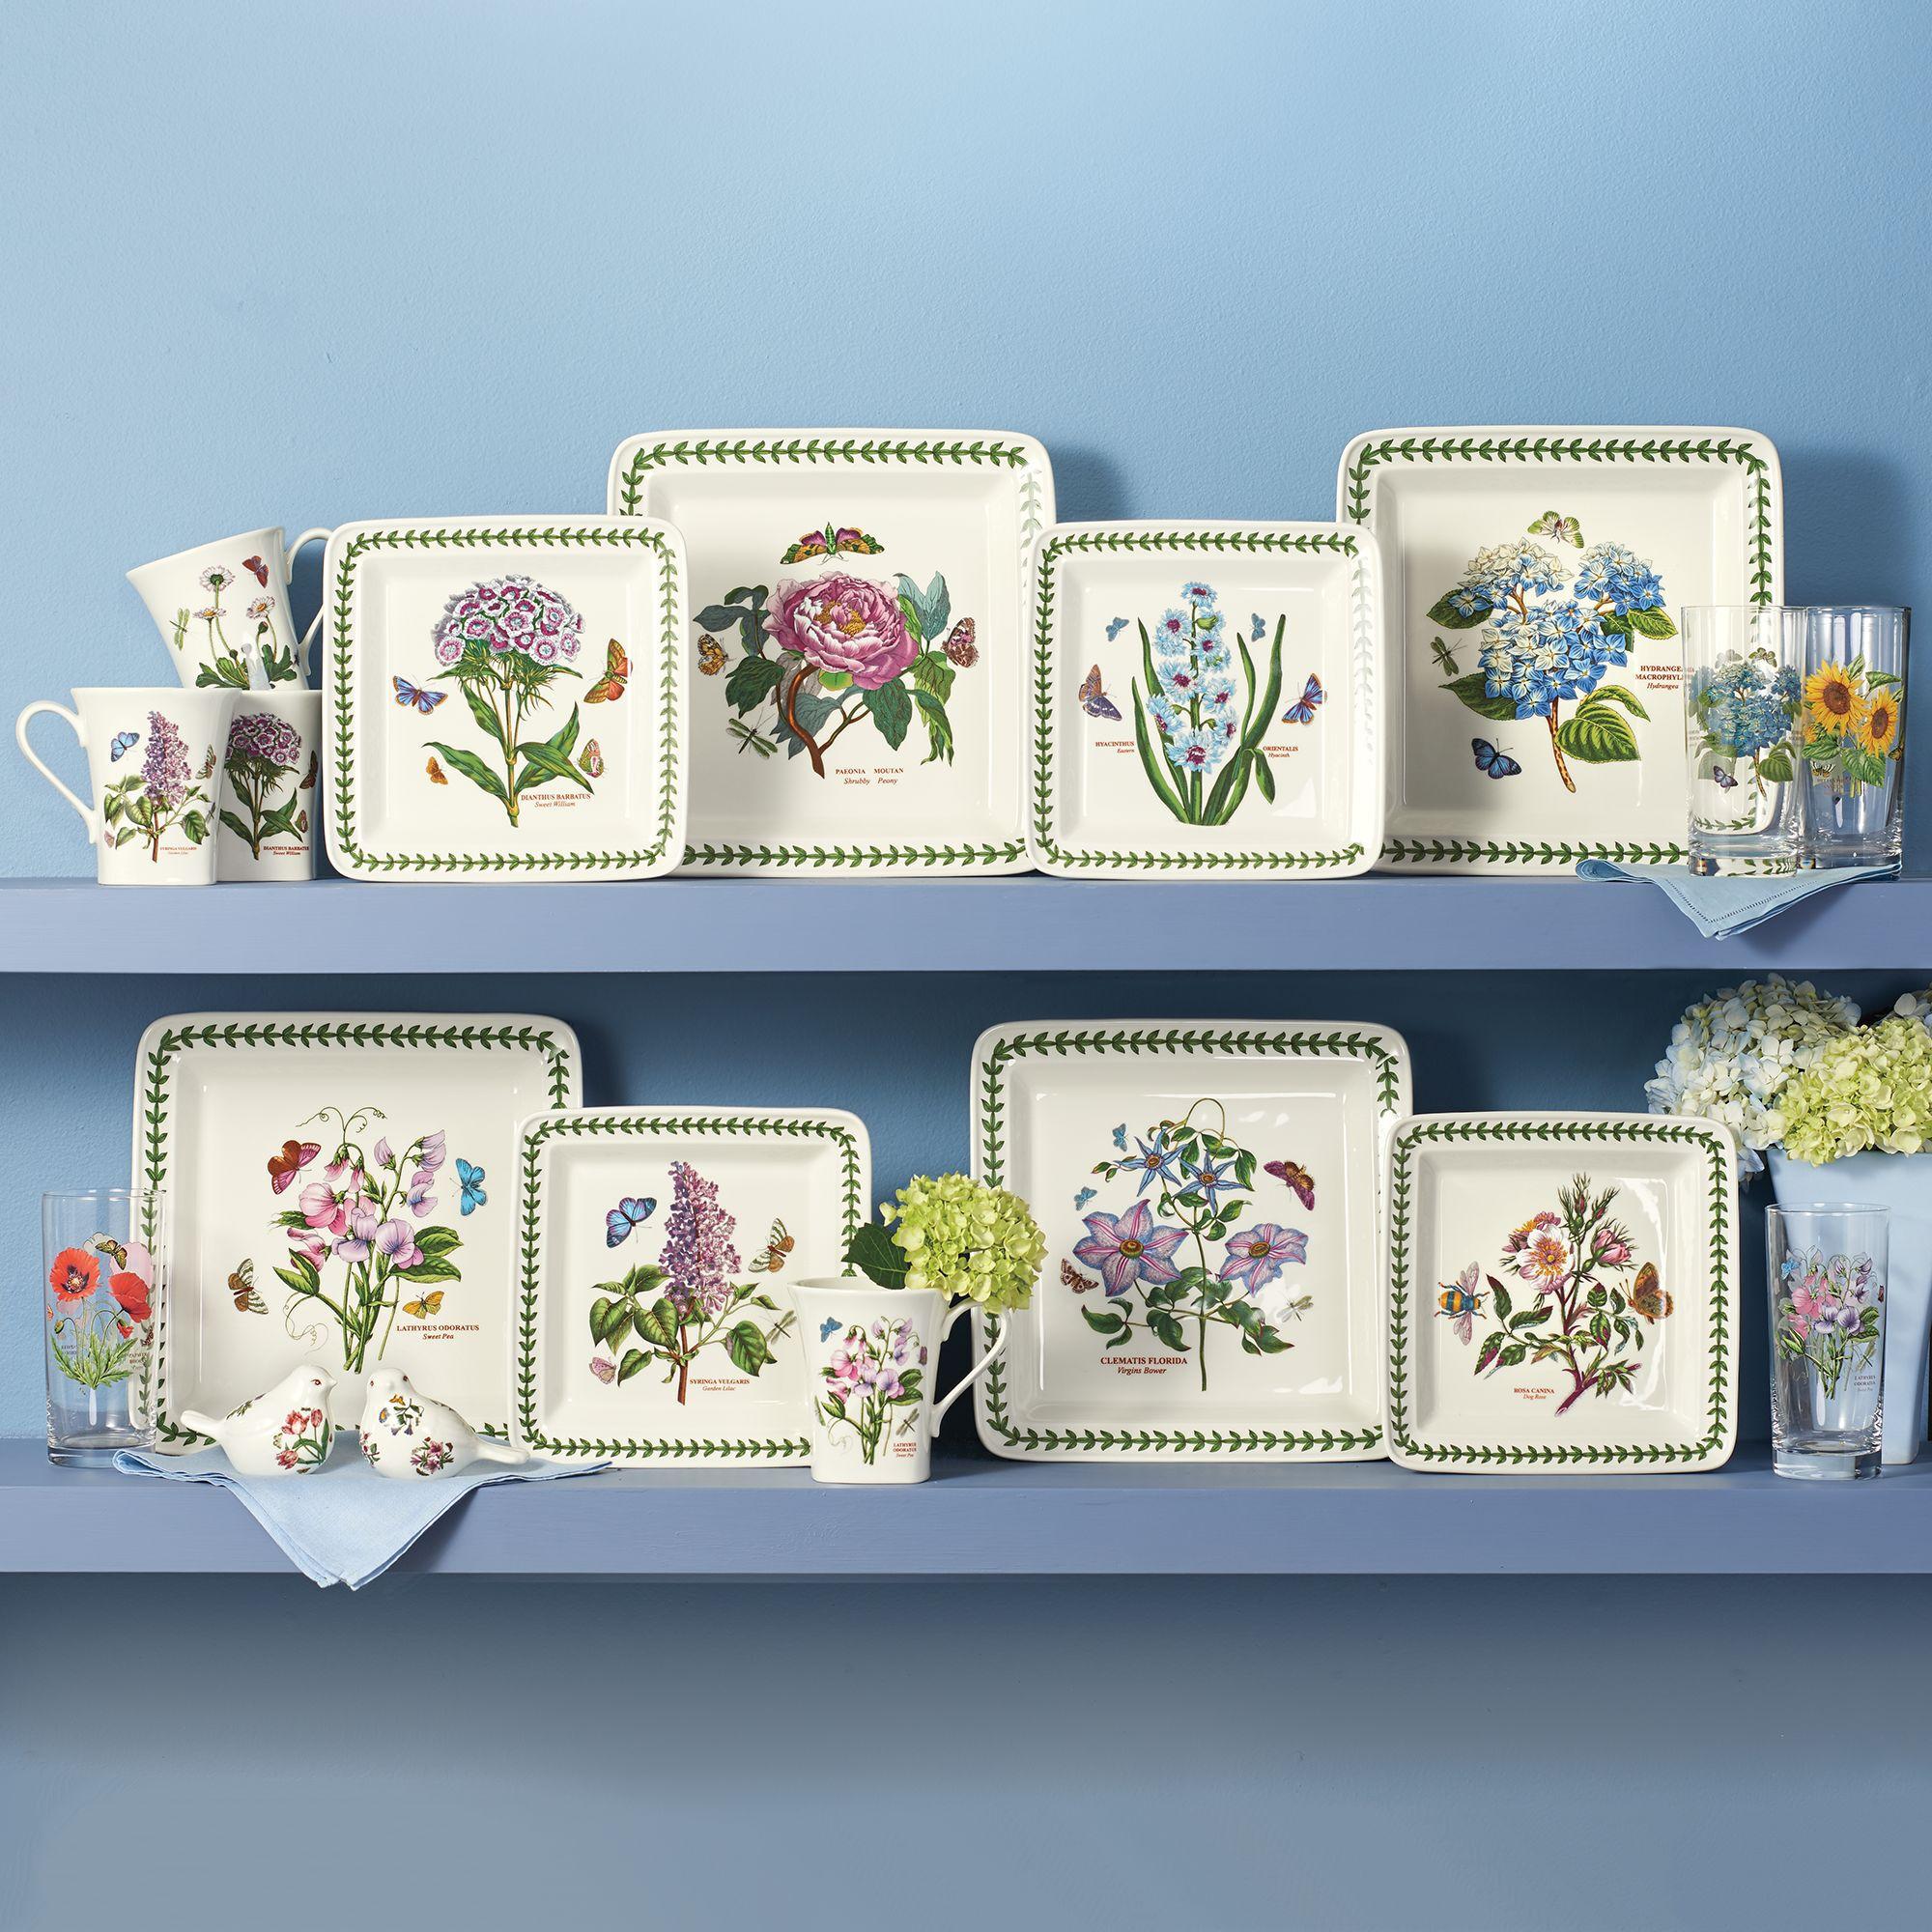 Portmeirion u0026quot;Botanic Gardenu0026quot; Porcelain Dinnerware  default  sc 1 st  Ross-Simons & Portmeirion